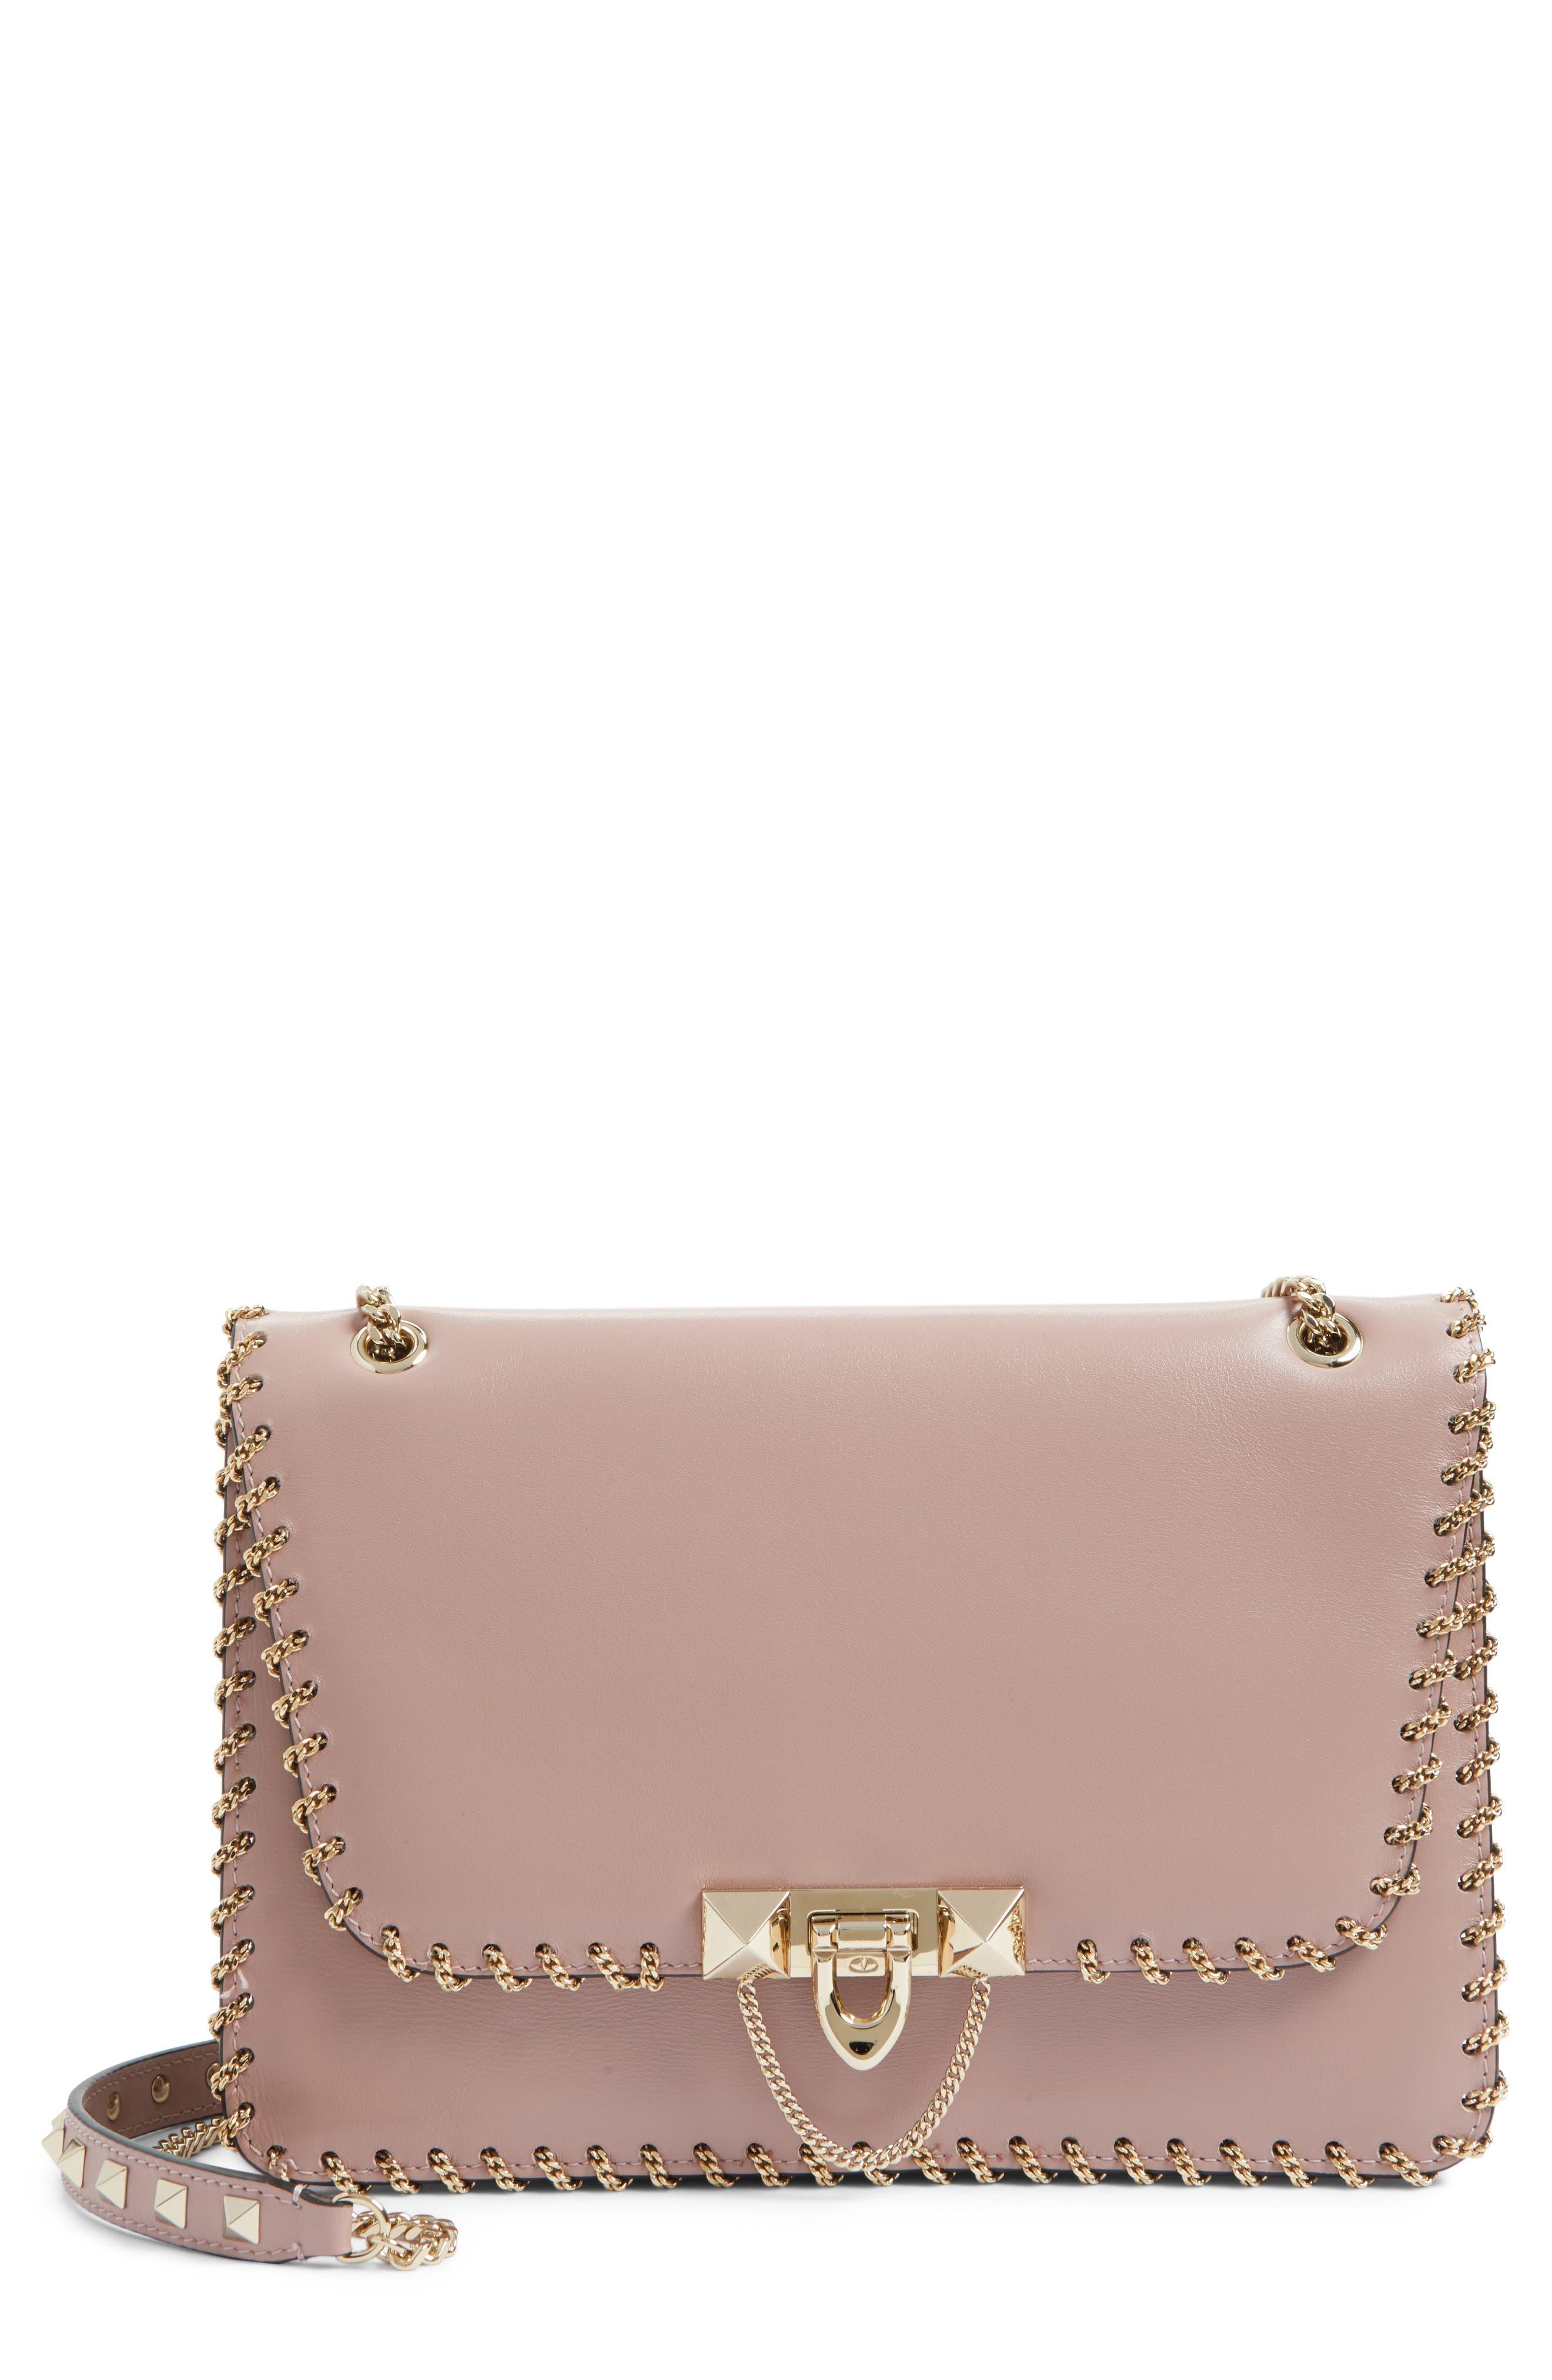 Demilune Whipstitch Leather Shoulder Bag,                         Main,                         color, Lipstick